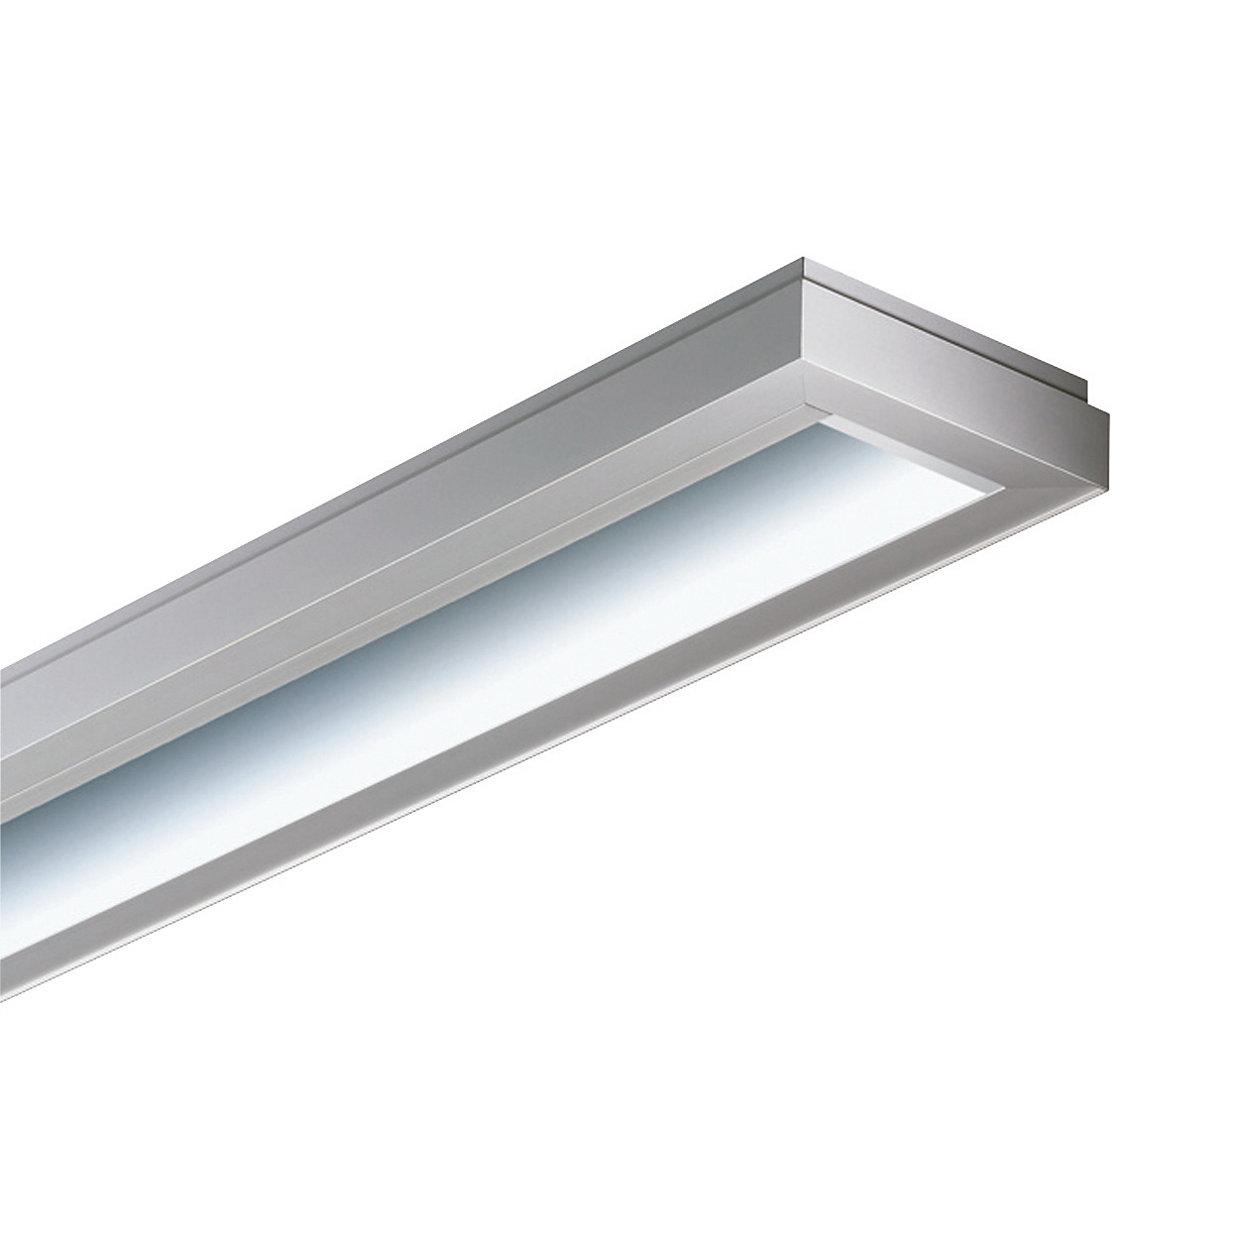 Arano asymmetric – high-performance wall-washer